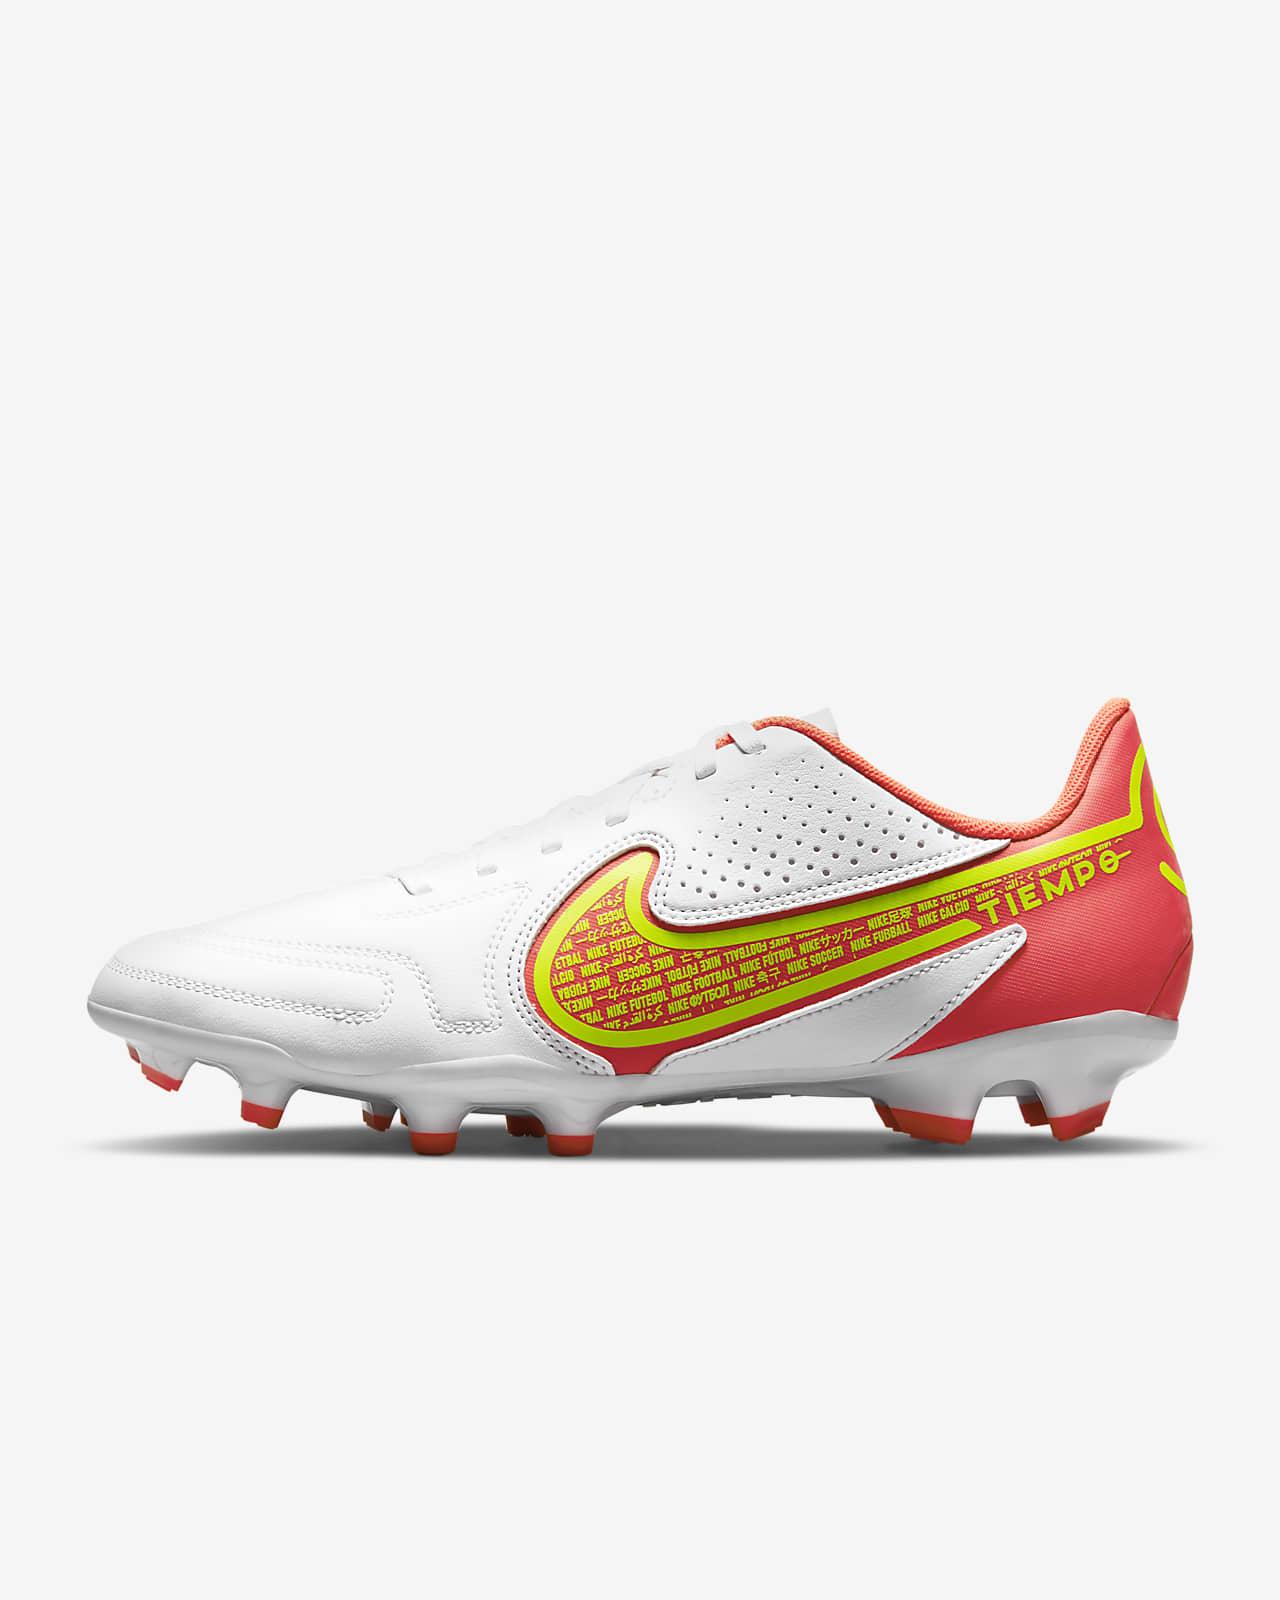 Chaussure de football multi-surfaces à crampons Nike Tiempo Legend 9 Club MG